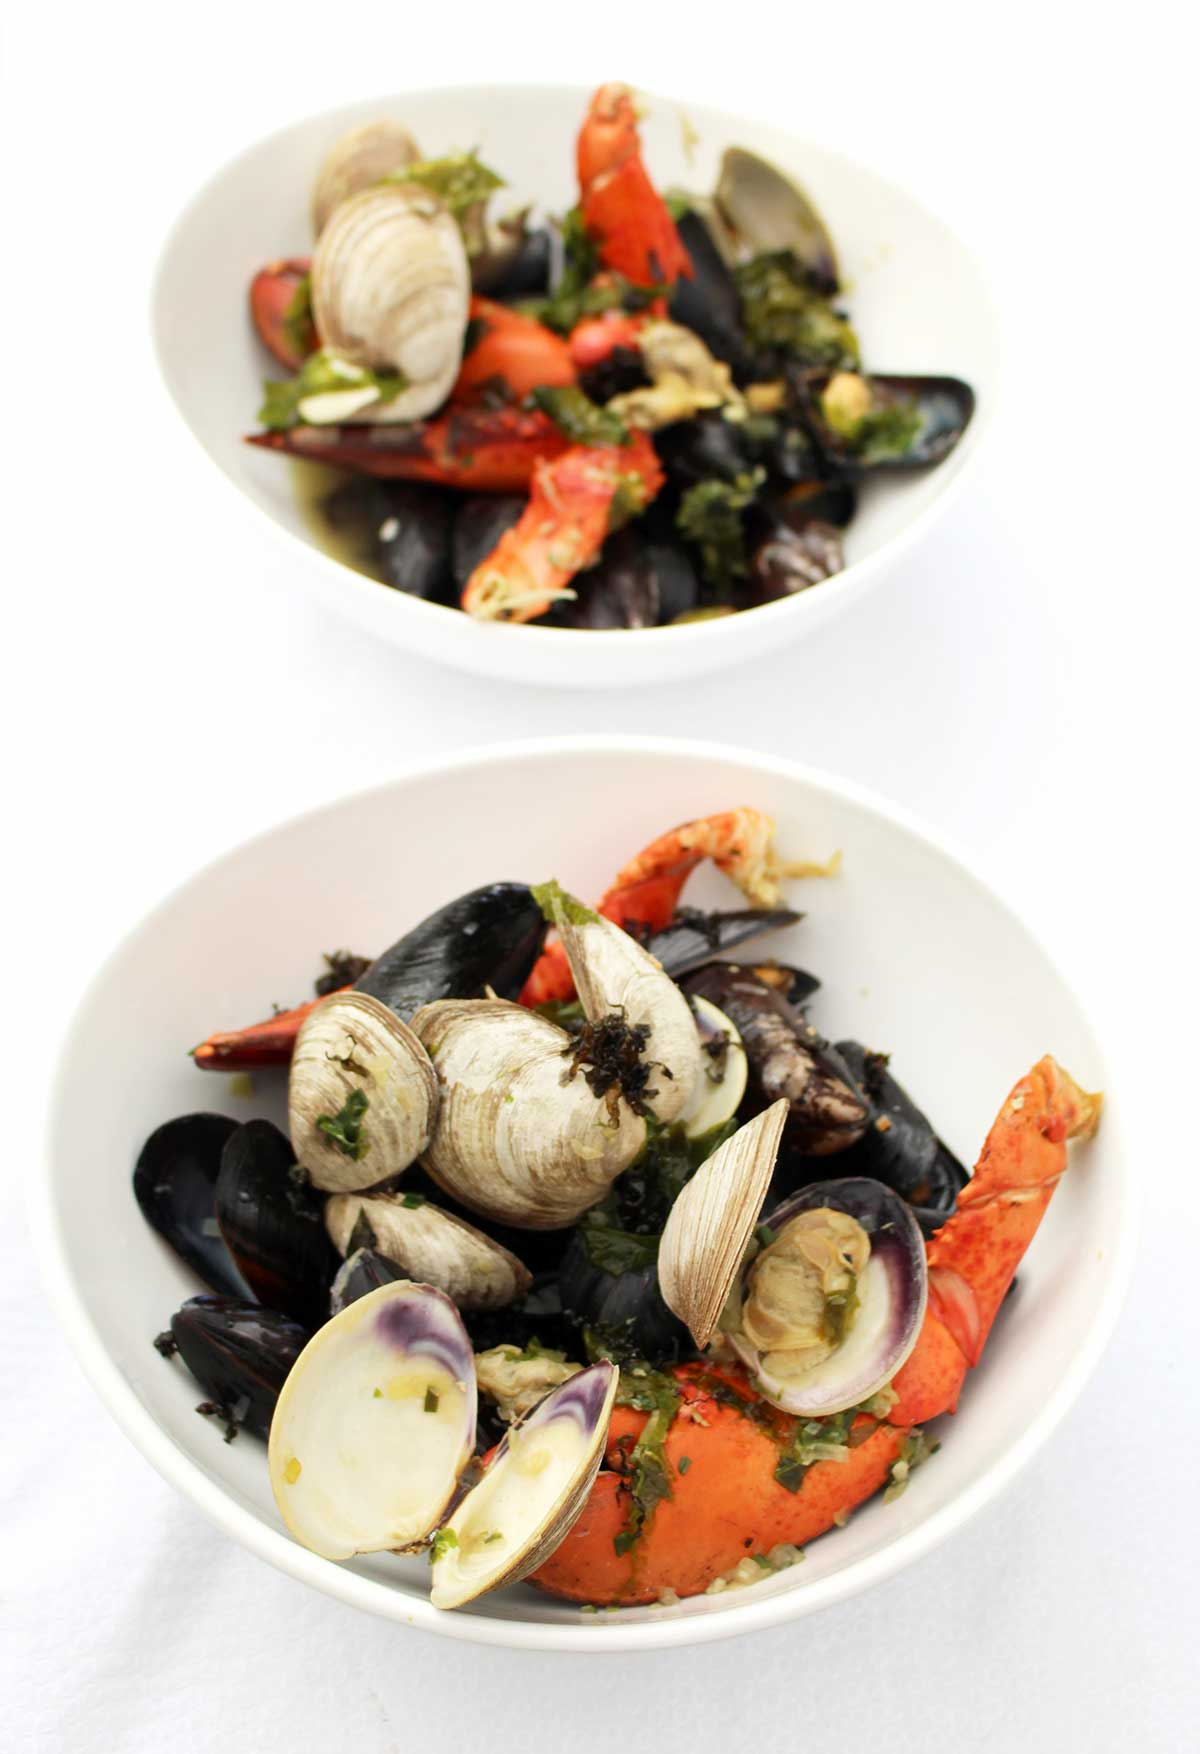 seafood-in-nova-scotia-with-dulse